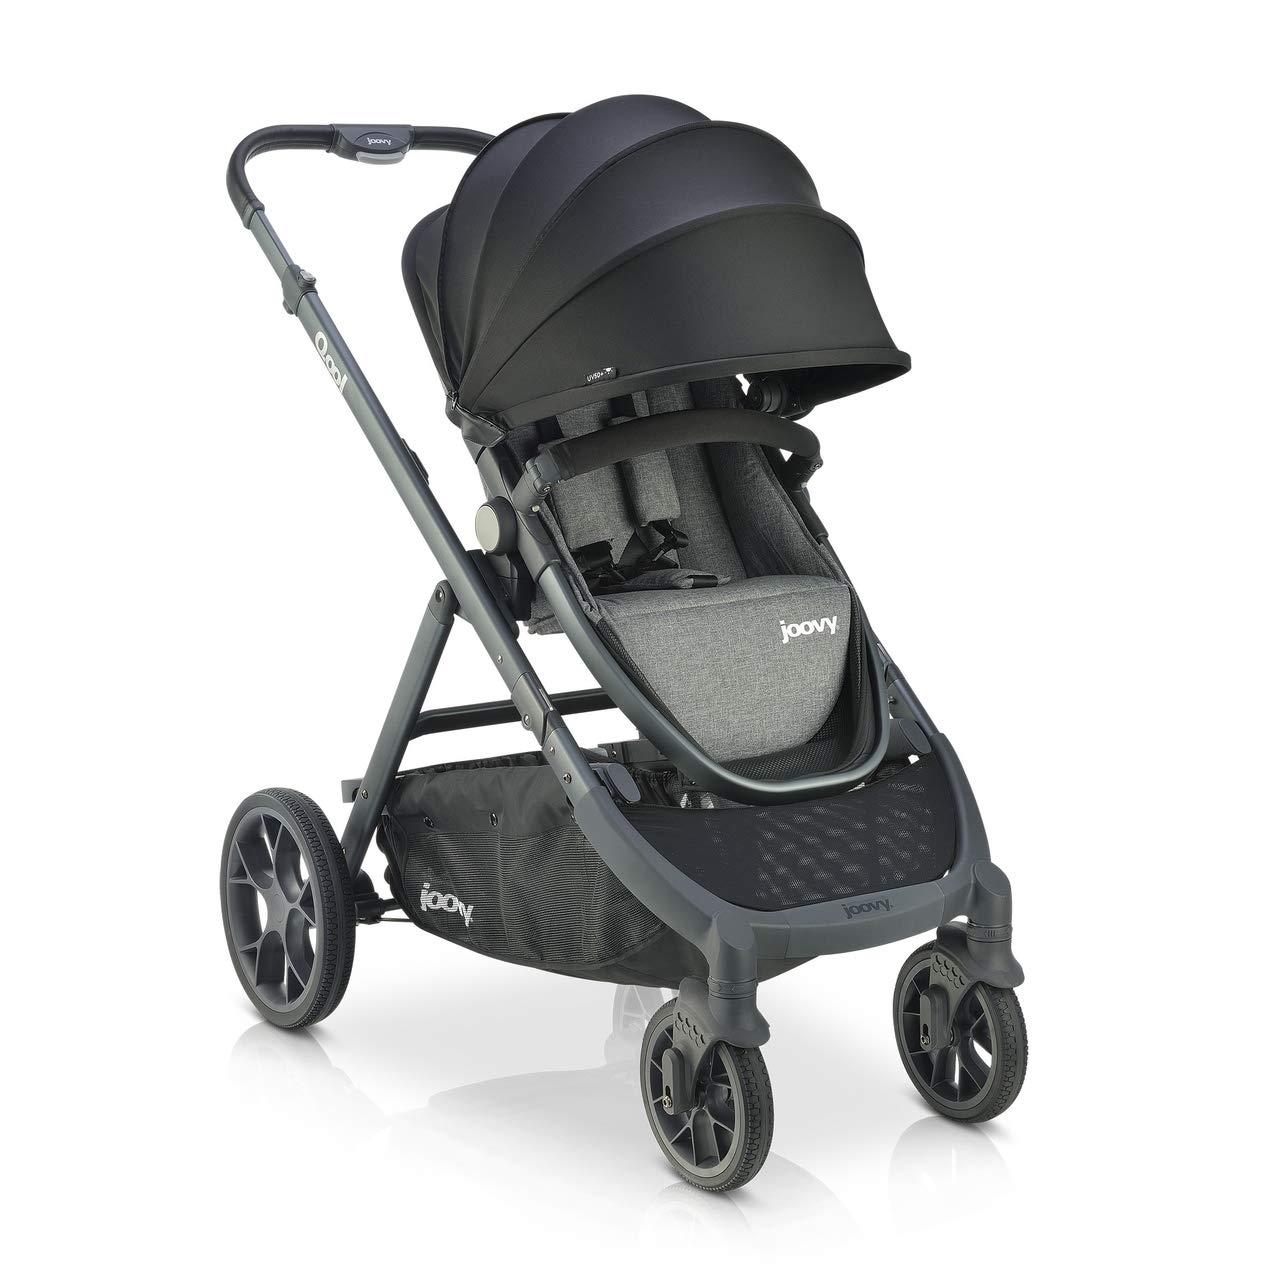 Joovy Qool Stroller, Customizable Stroller, Single, Double, Triple, Grey Melange